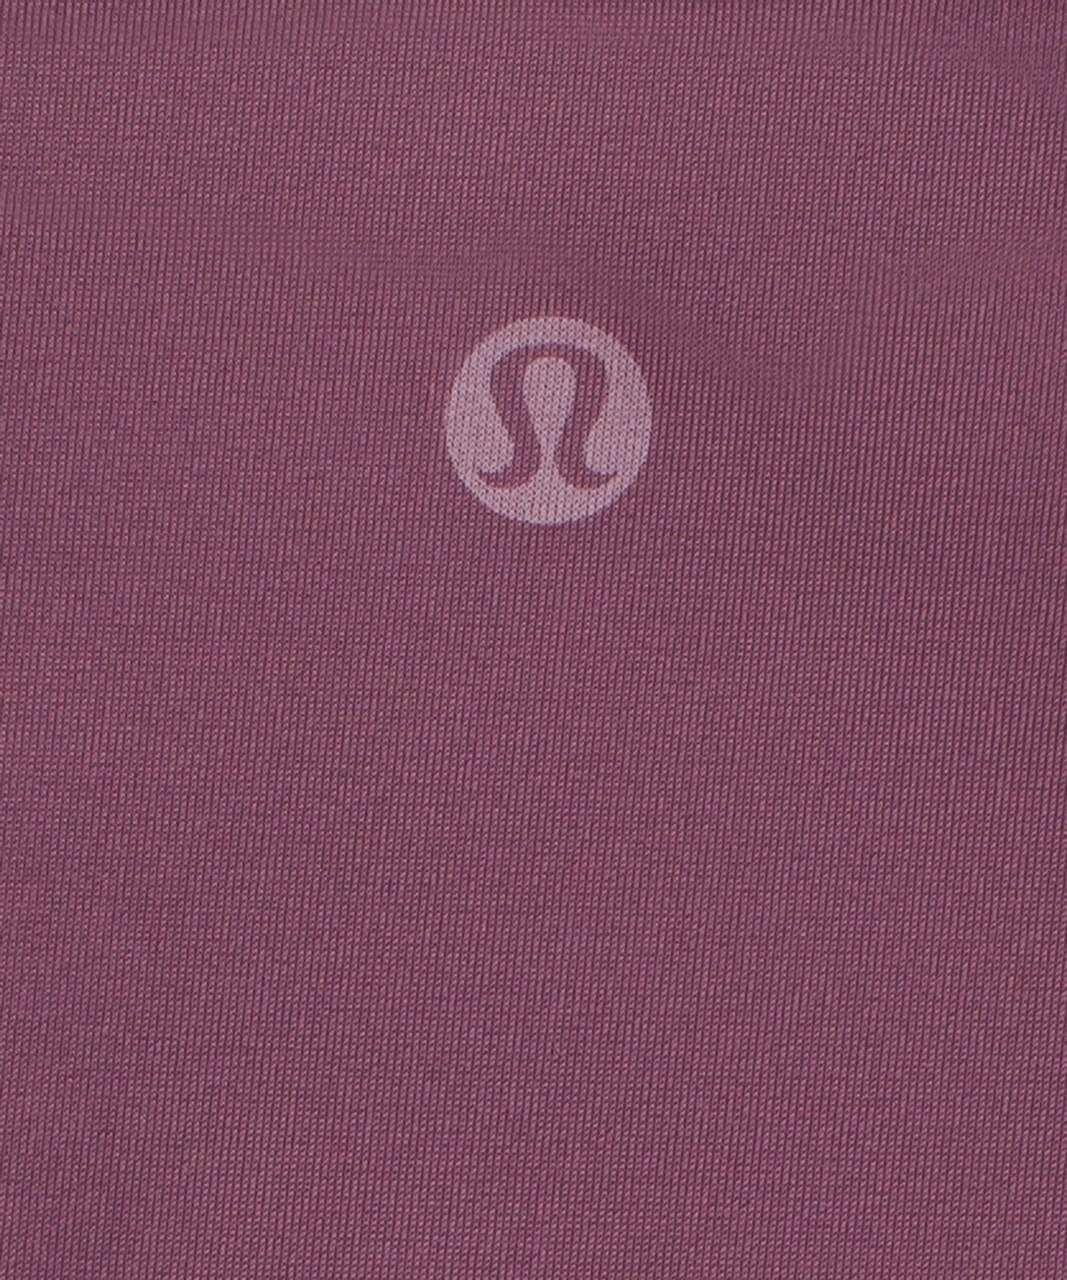 Lululemon InvisiWear Mid-Rise Thong Underwear 3 Pack - Chrome / Brick Purple / Dew Green